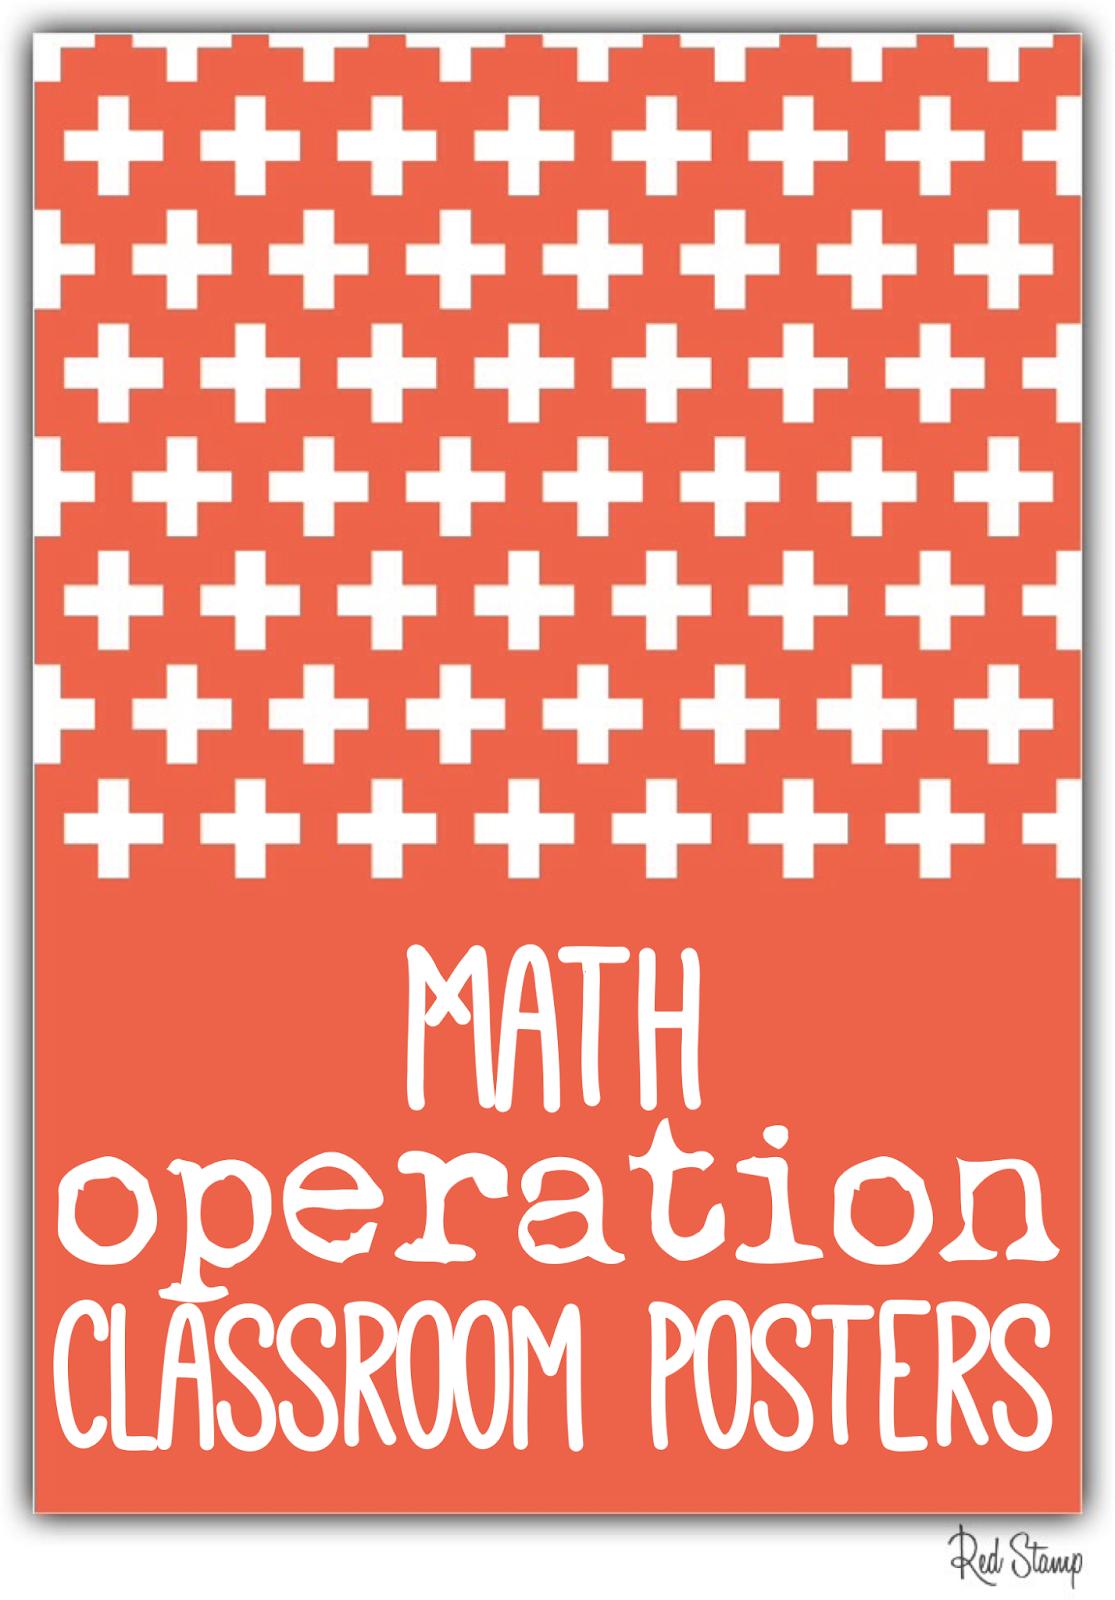 http://www.teachersnotebook.com/product/mnschenk/operations-signs